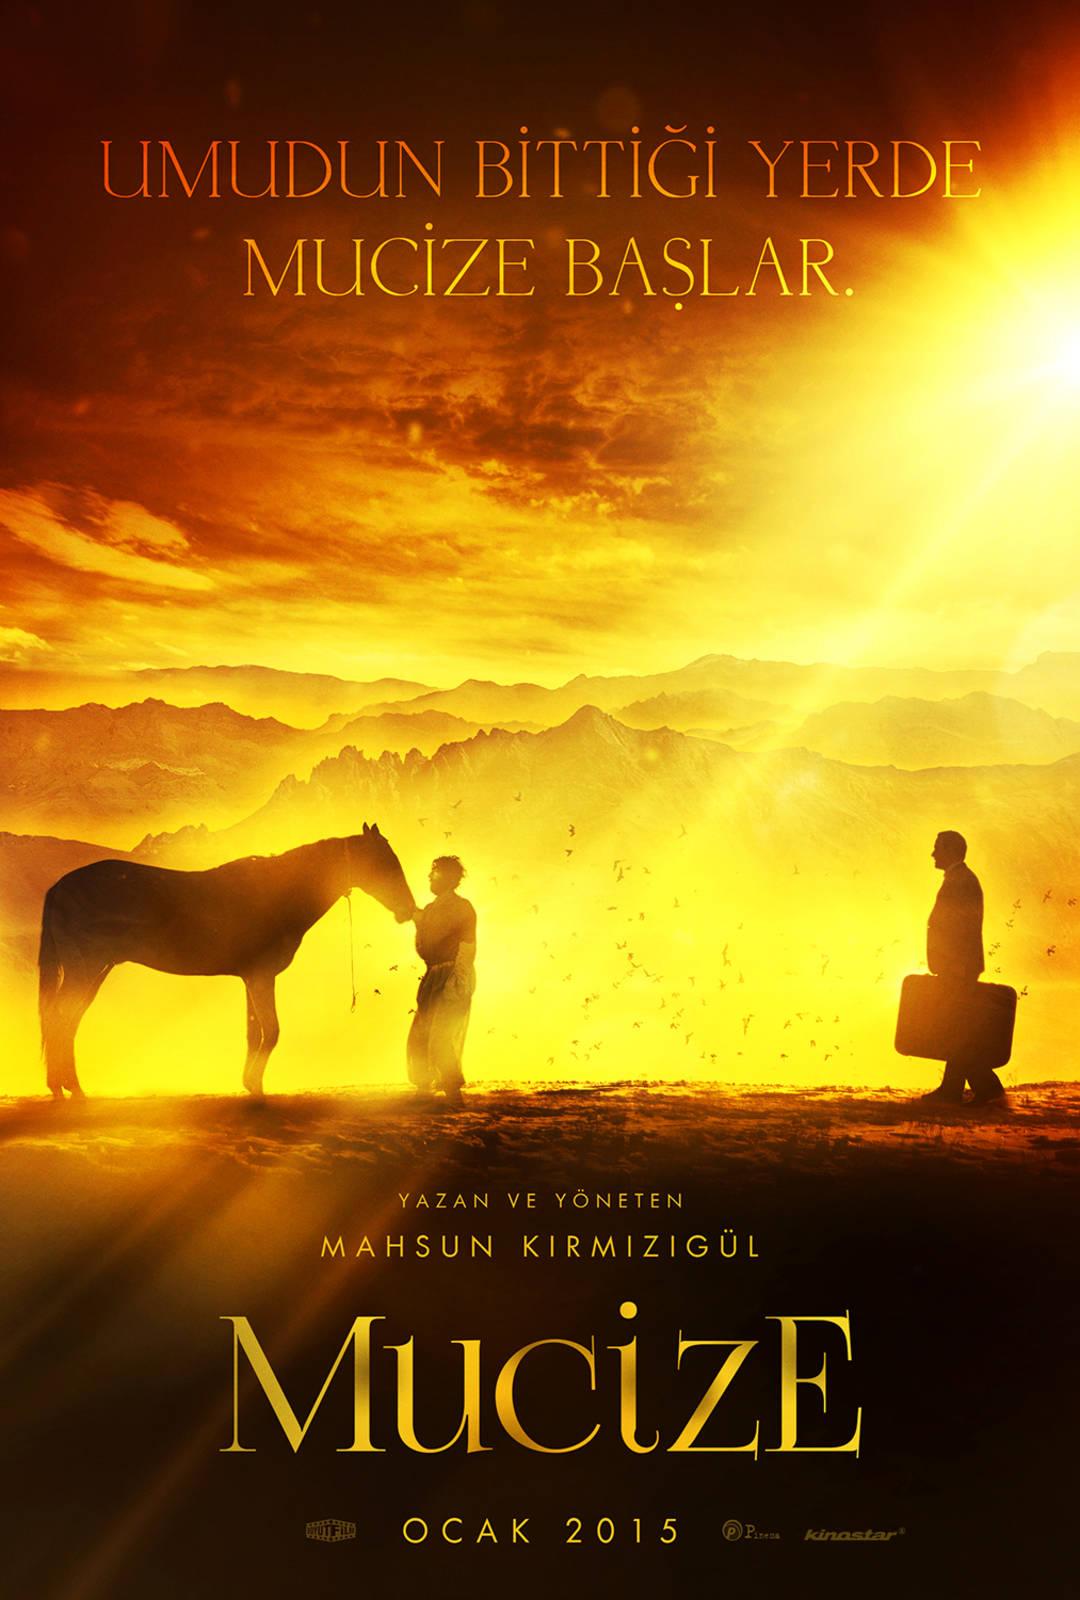 Mucize - Mahsun Kirmizigül